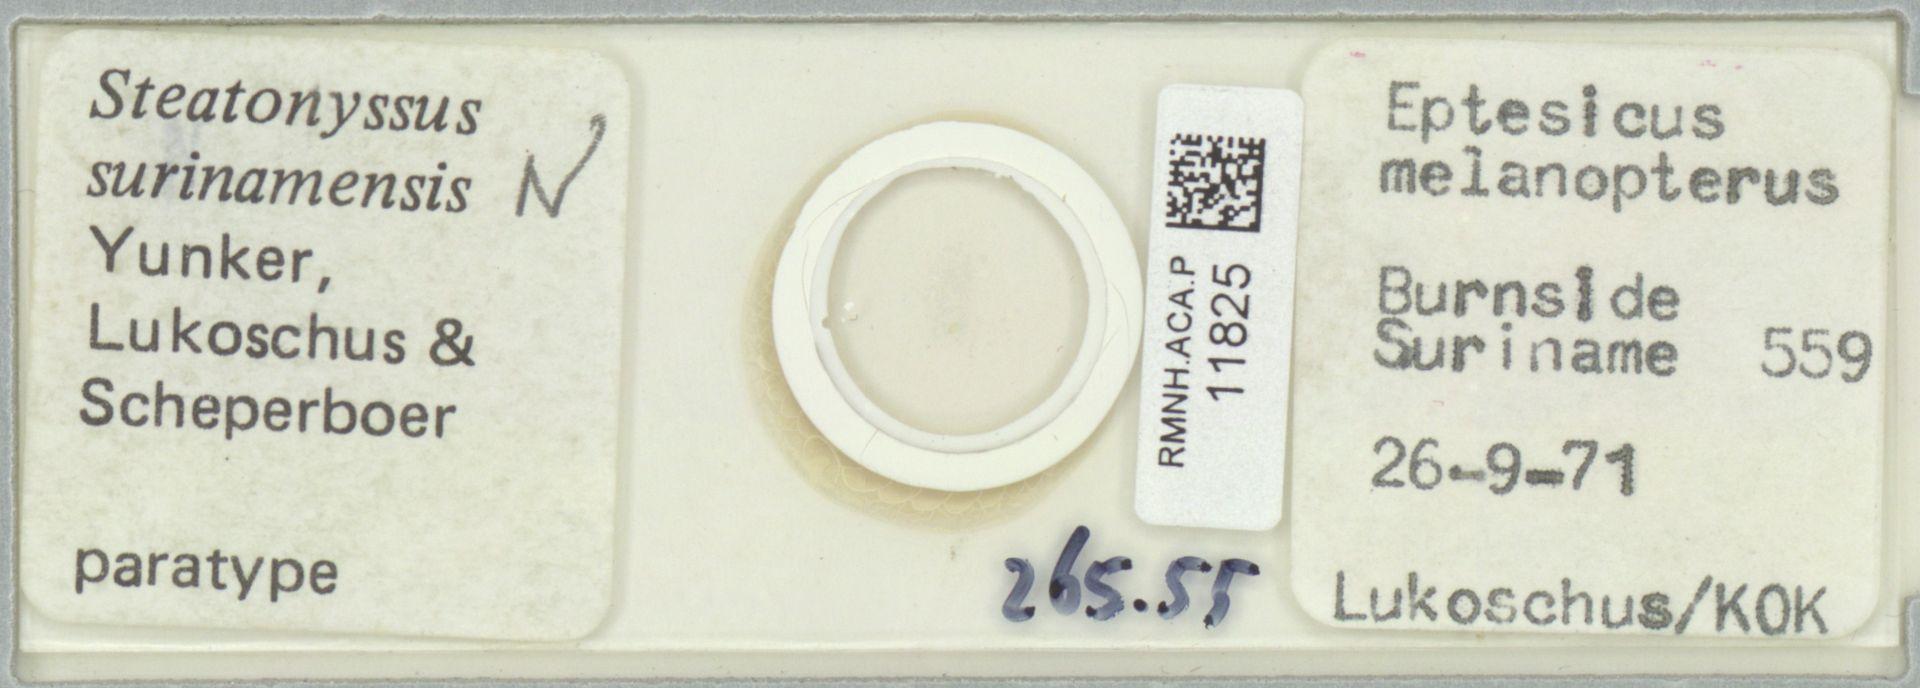 RMNH.ACA.P.11825 | Steatonyssus surinamensis